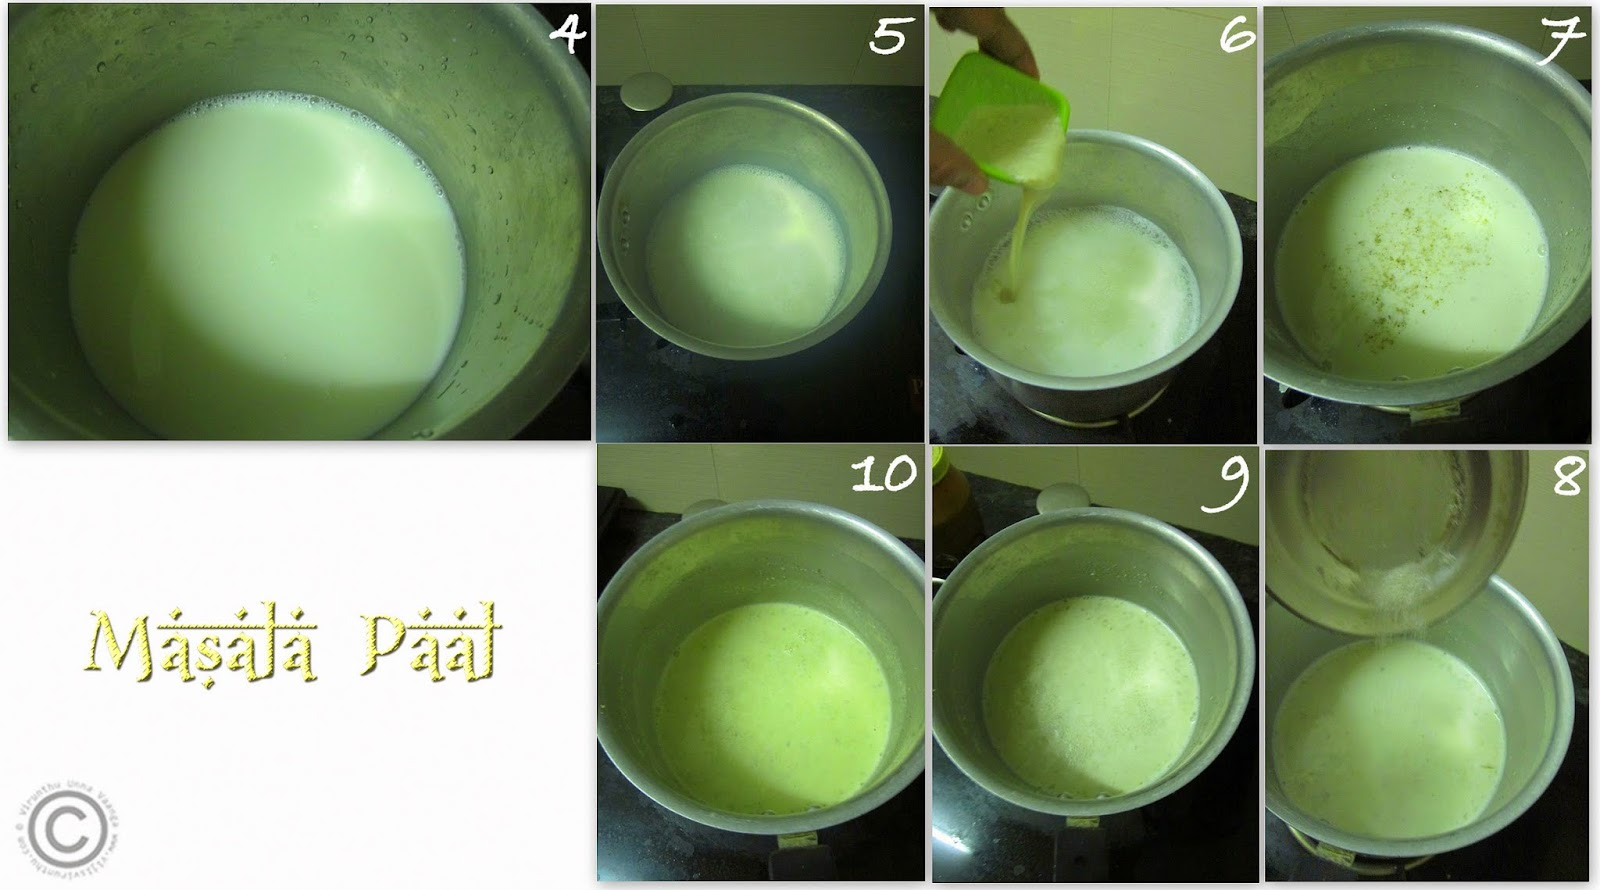 badam-paal-milk